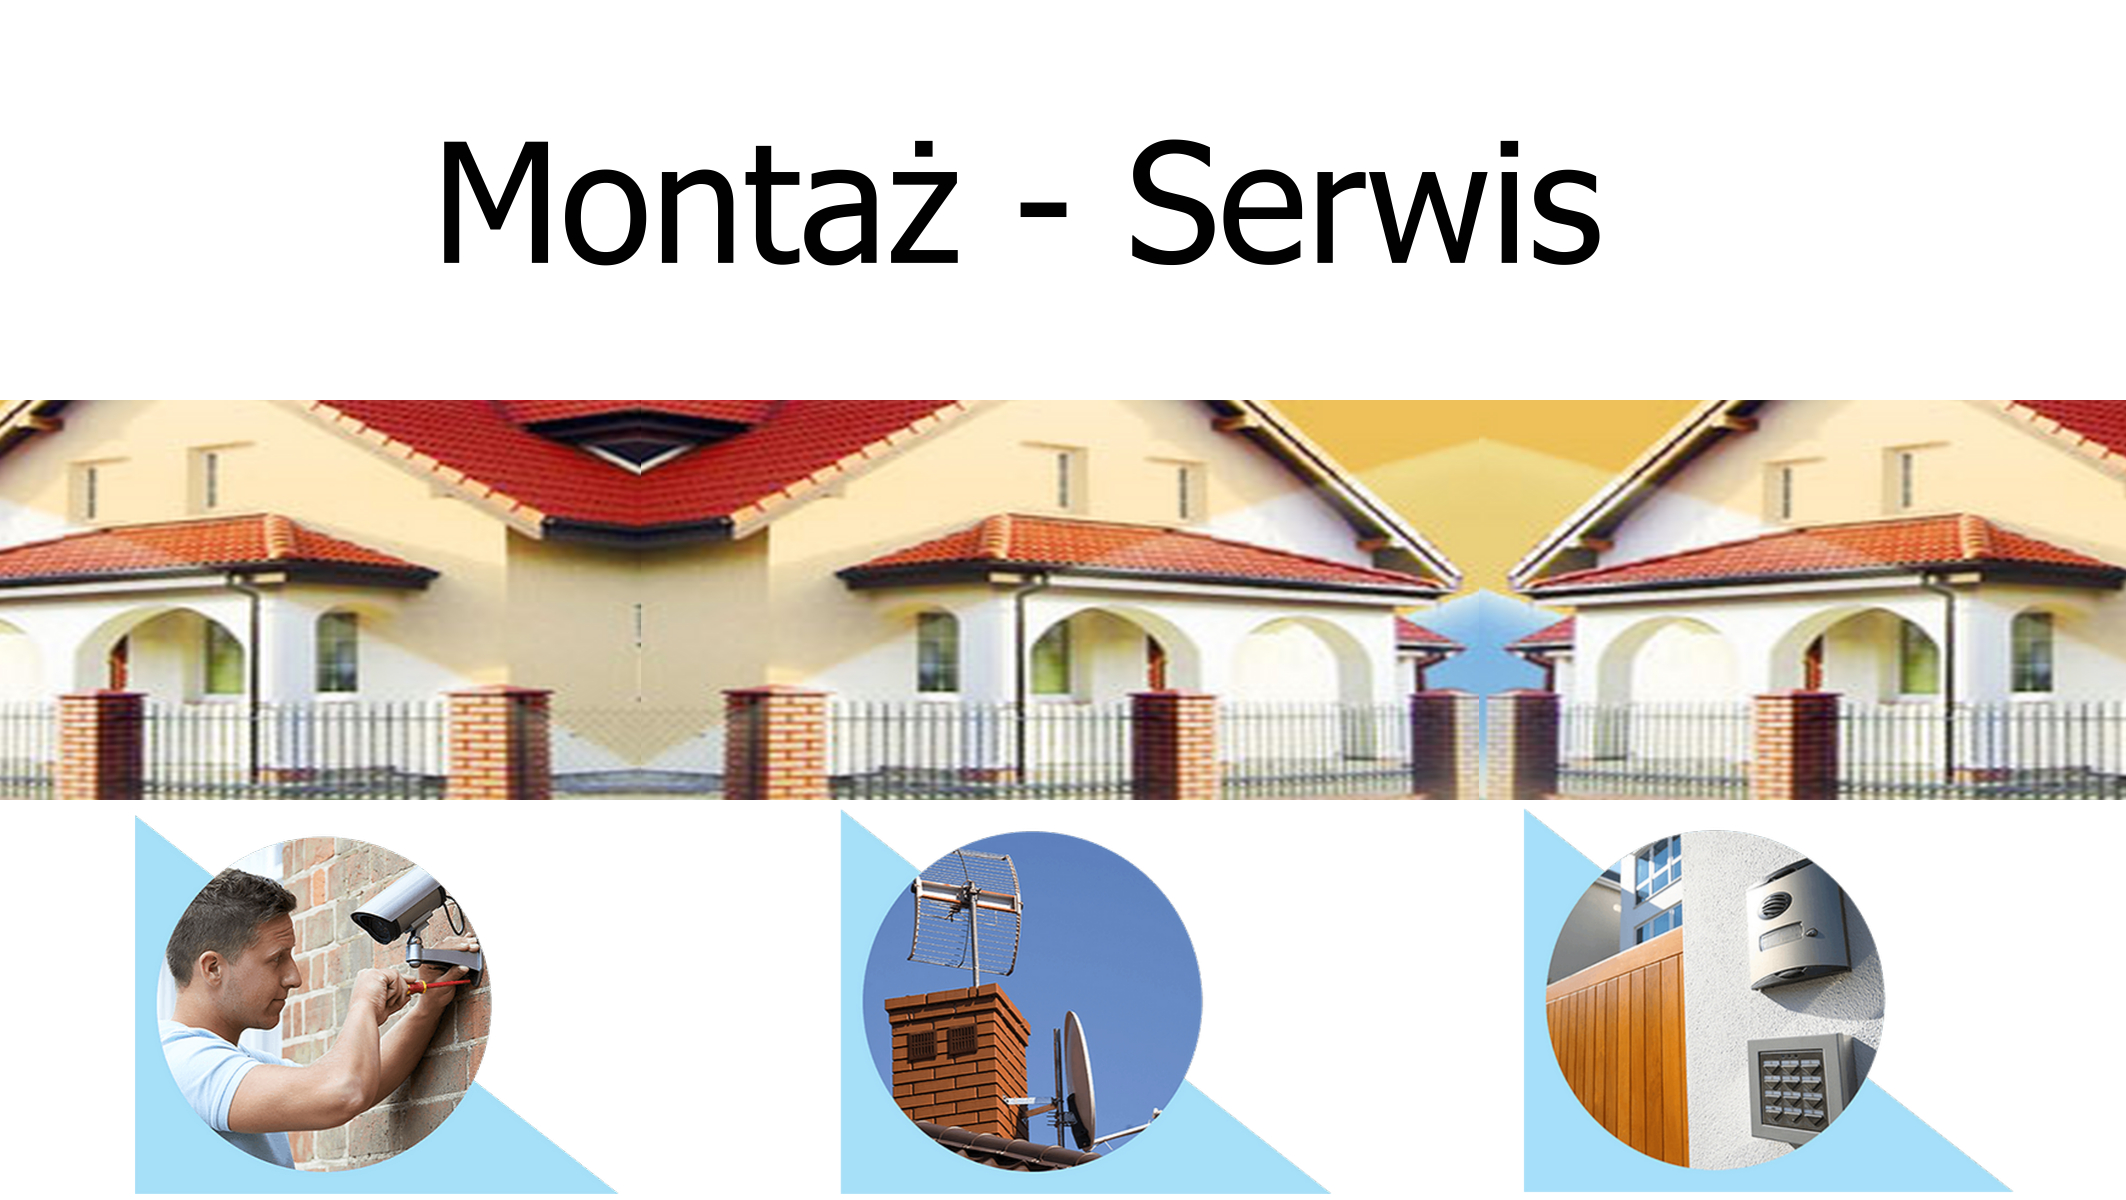 SOMAPI. Systemy alarmowe, monitoring, domofony, instalacje TV SAT